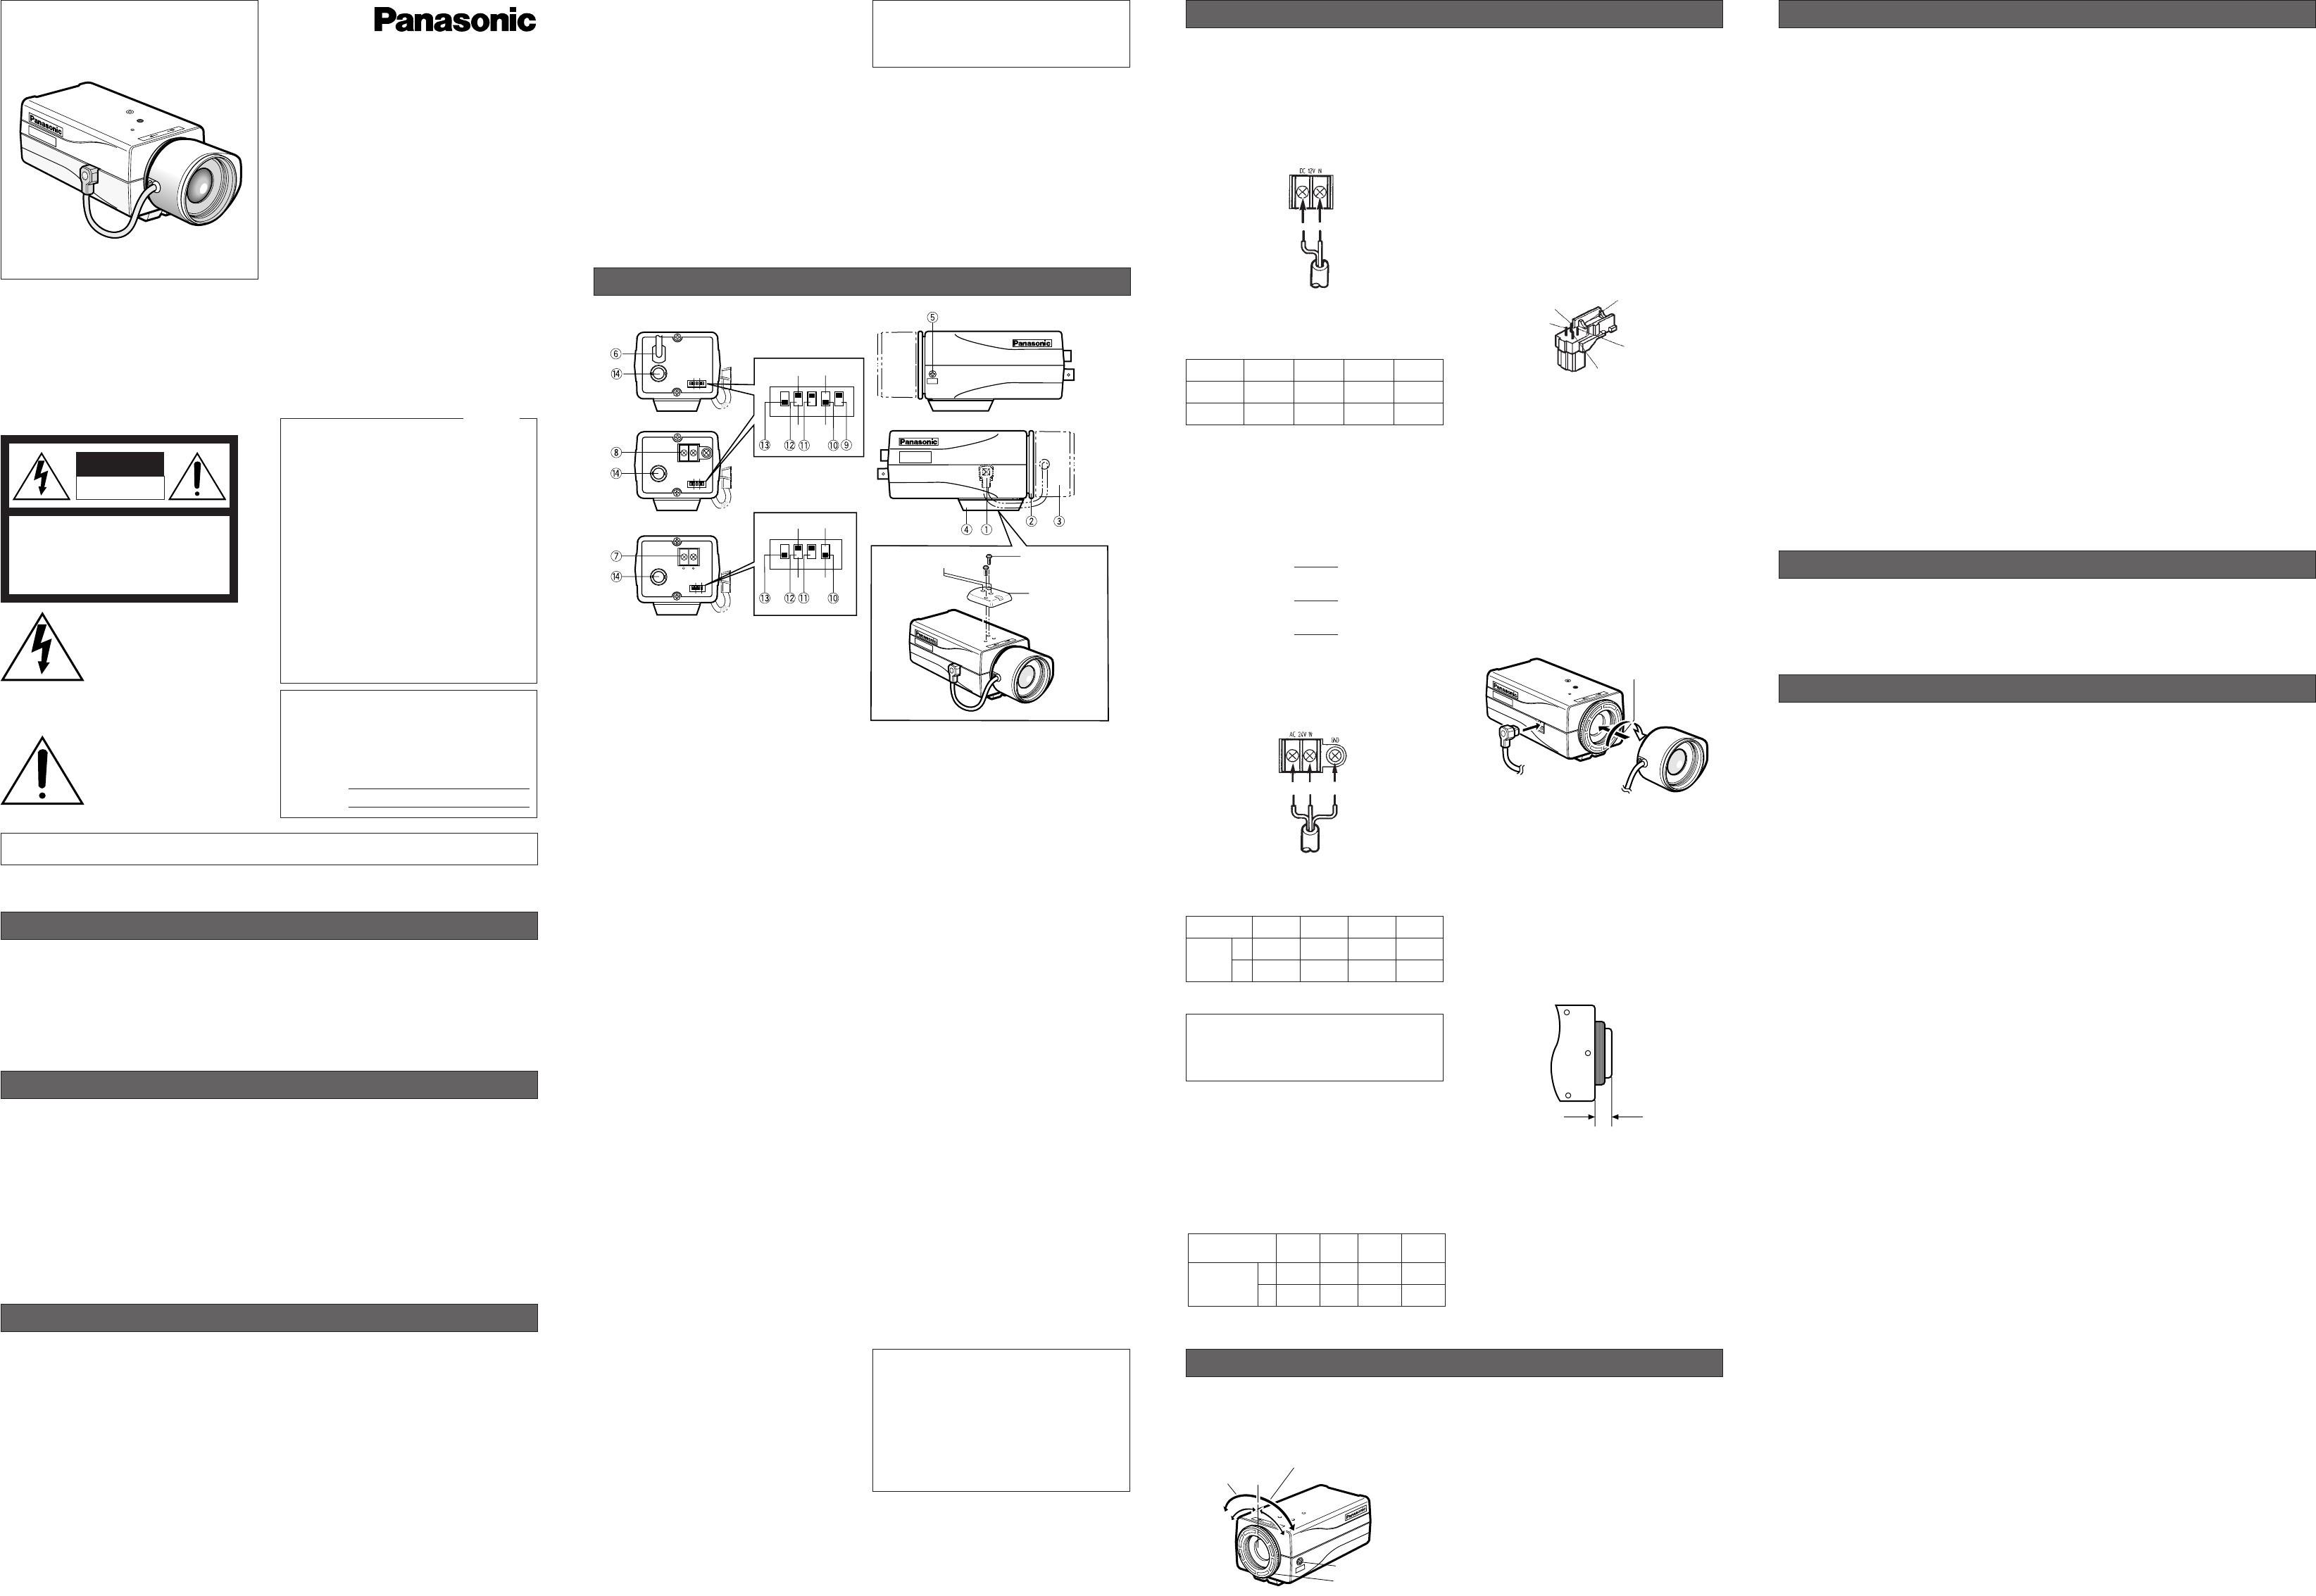 cctv camera wiring diagram wiring diagram image rh mainetreasurechest com Security Camera Schematics Chevy Factory Radio Wiring Diagram